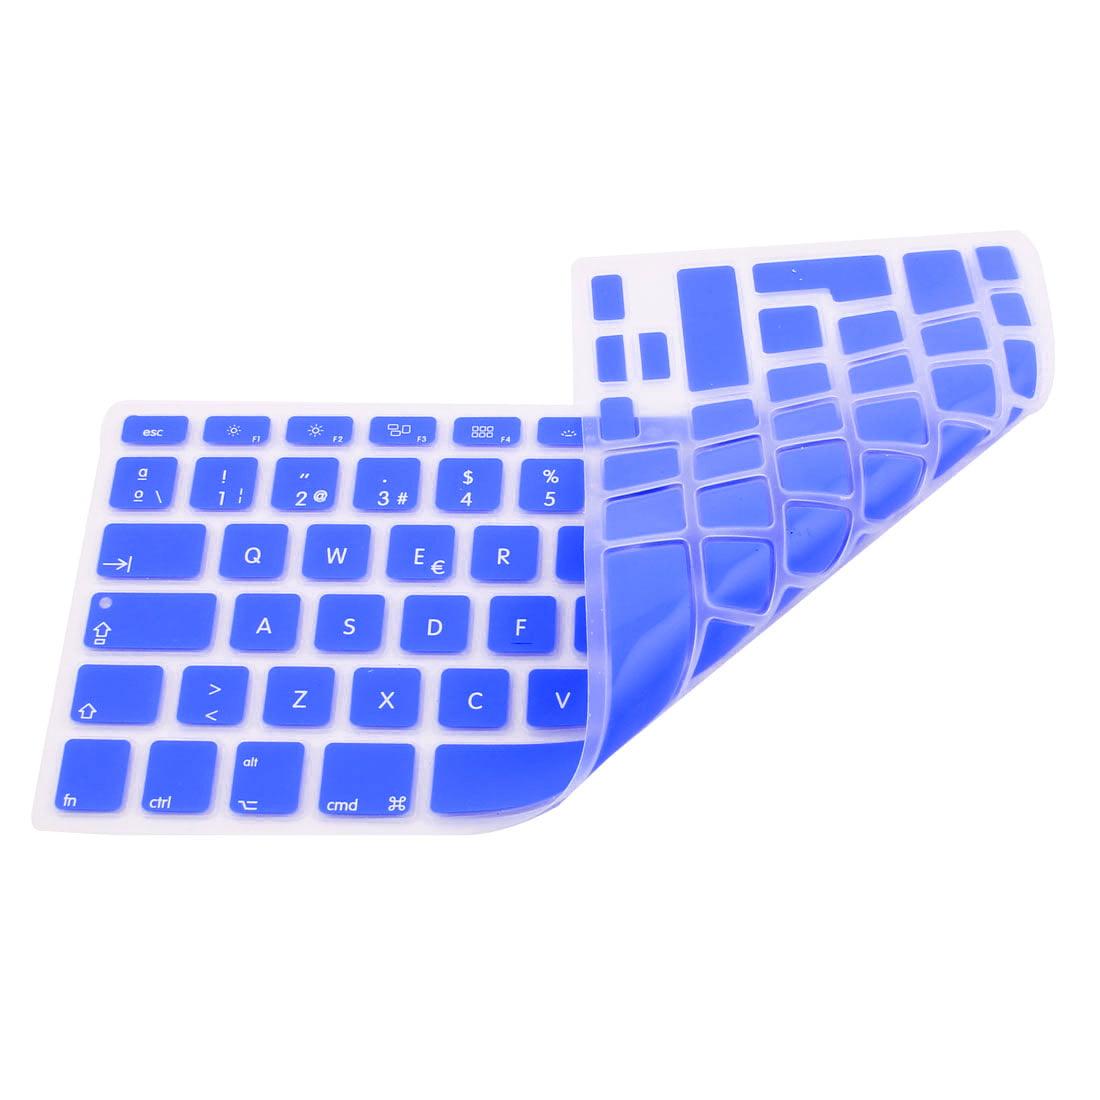 "Spanish Keyboard Skin Cover Dark Blue for Apple Macbook Air 13""15""17"" EU - image 1 of 2"